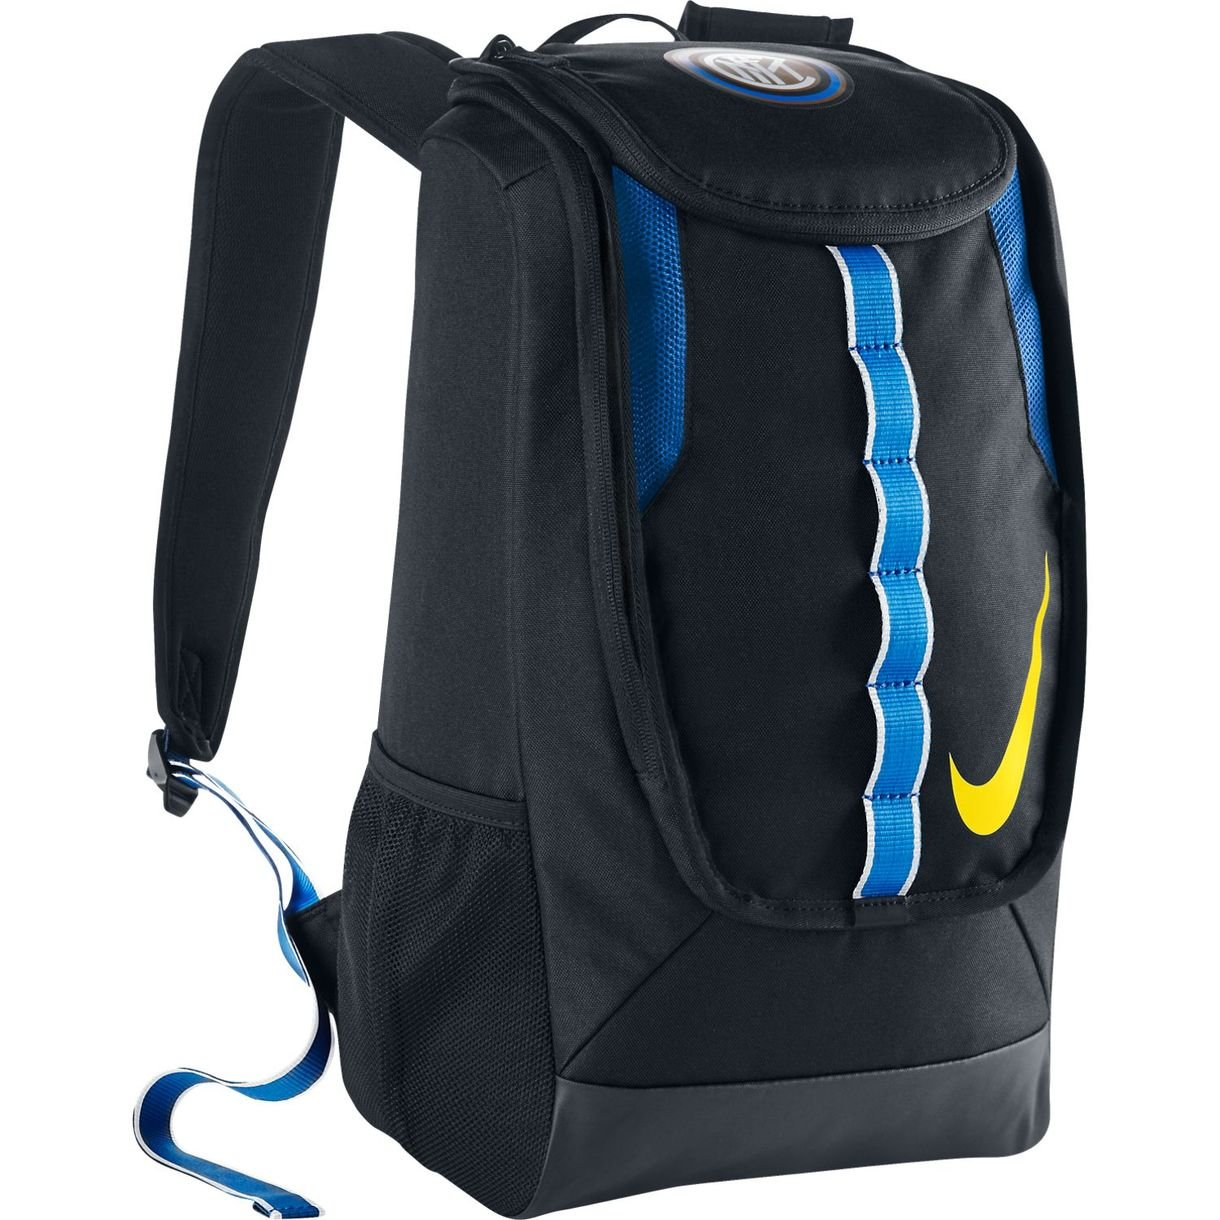 06db9f08ef 2016-2017 Inter Milan Nike Allegiance Shield Backpack (Black ...